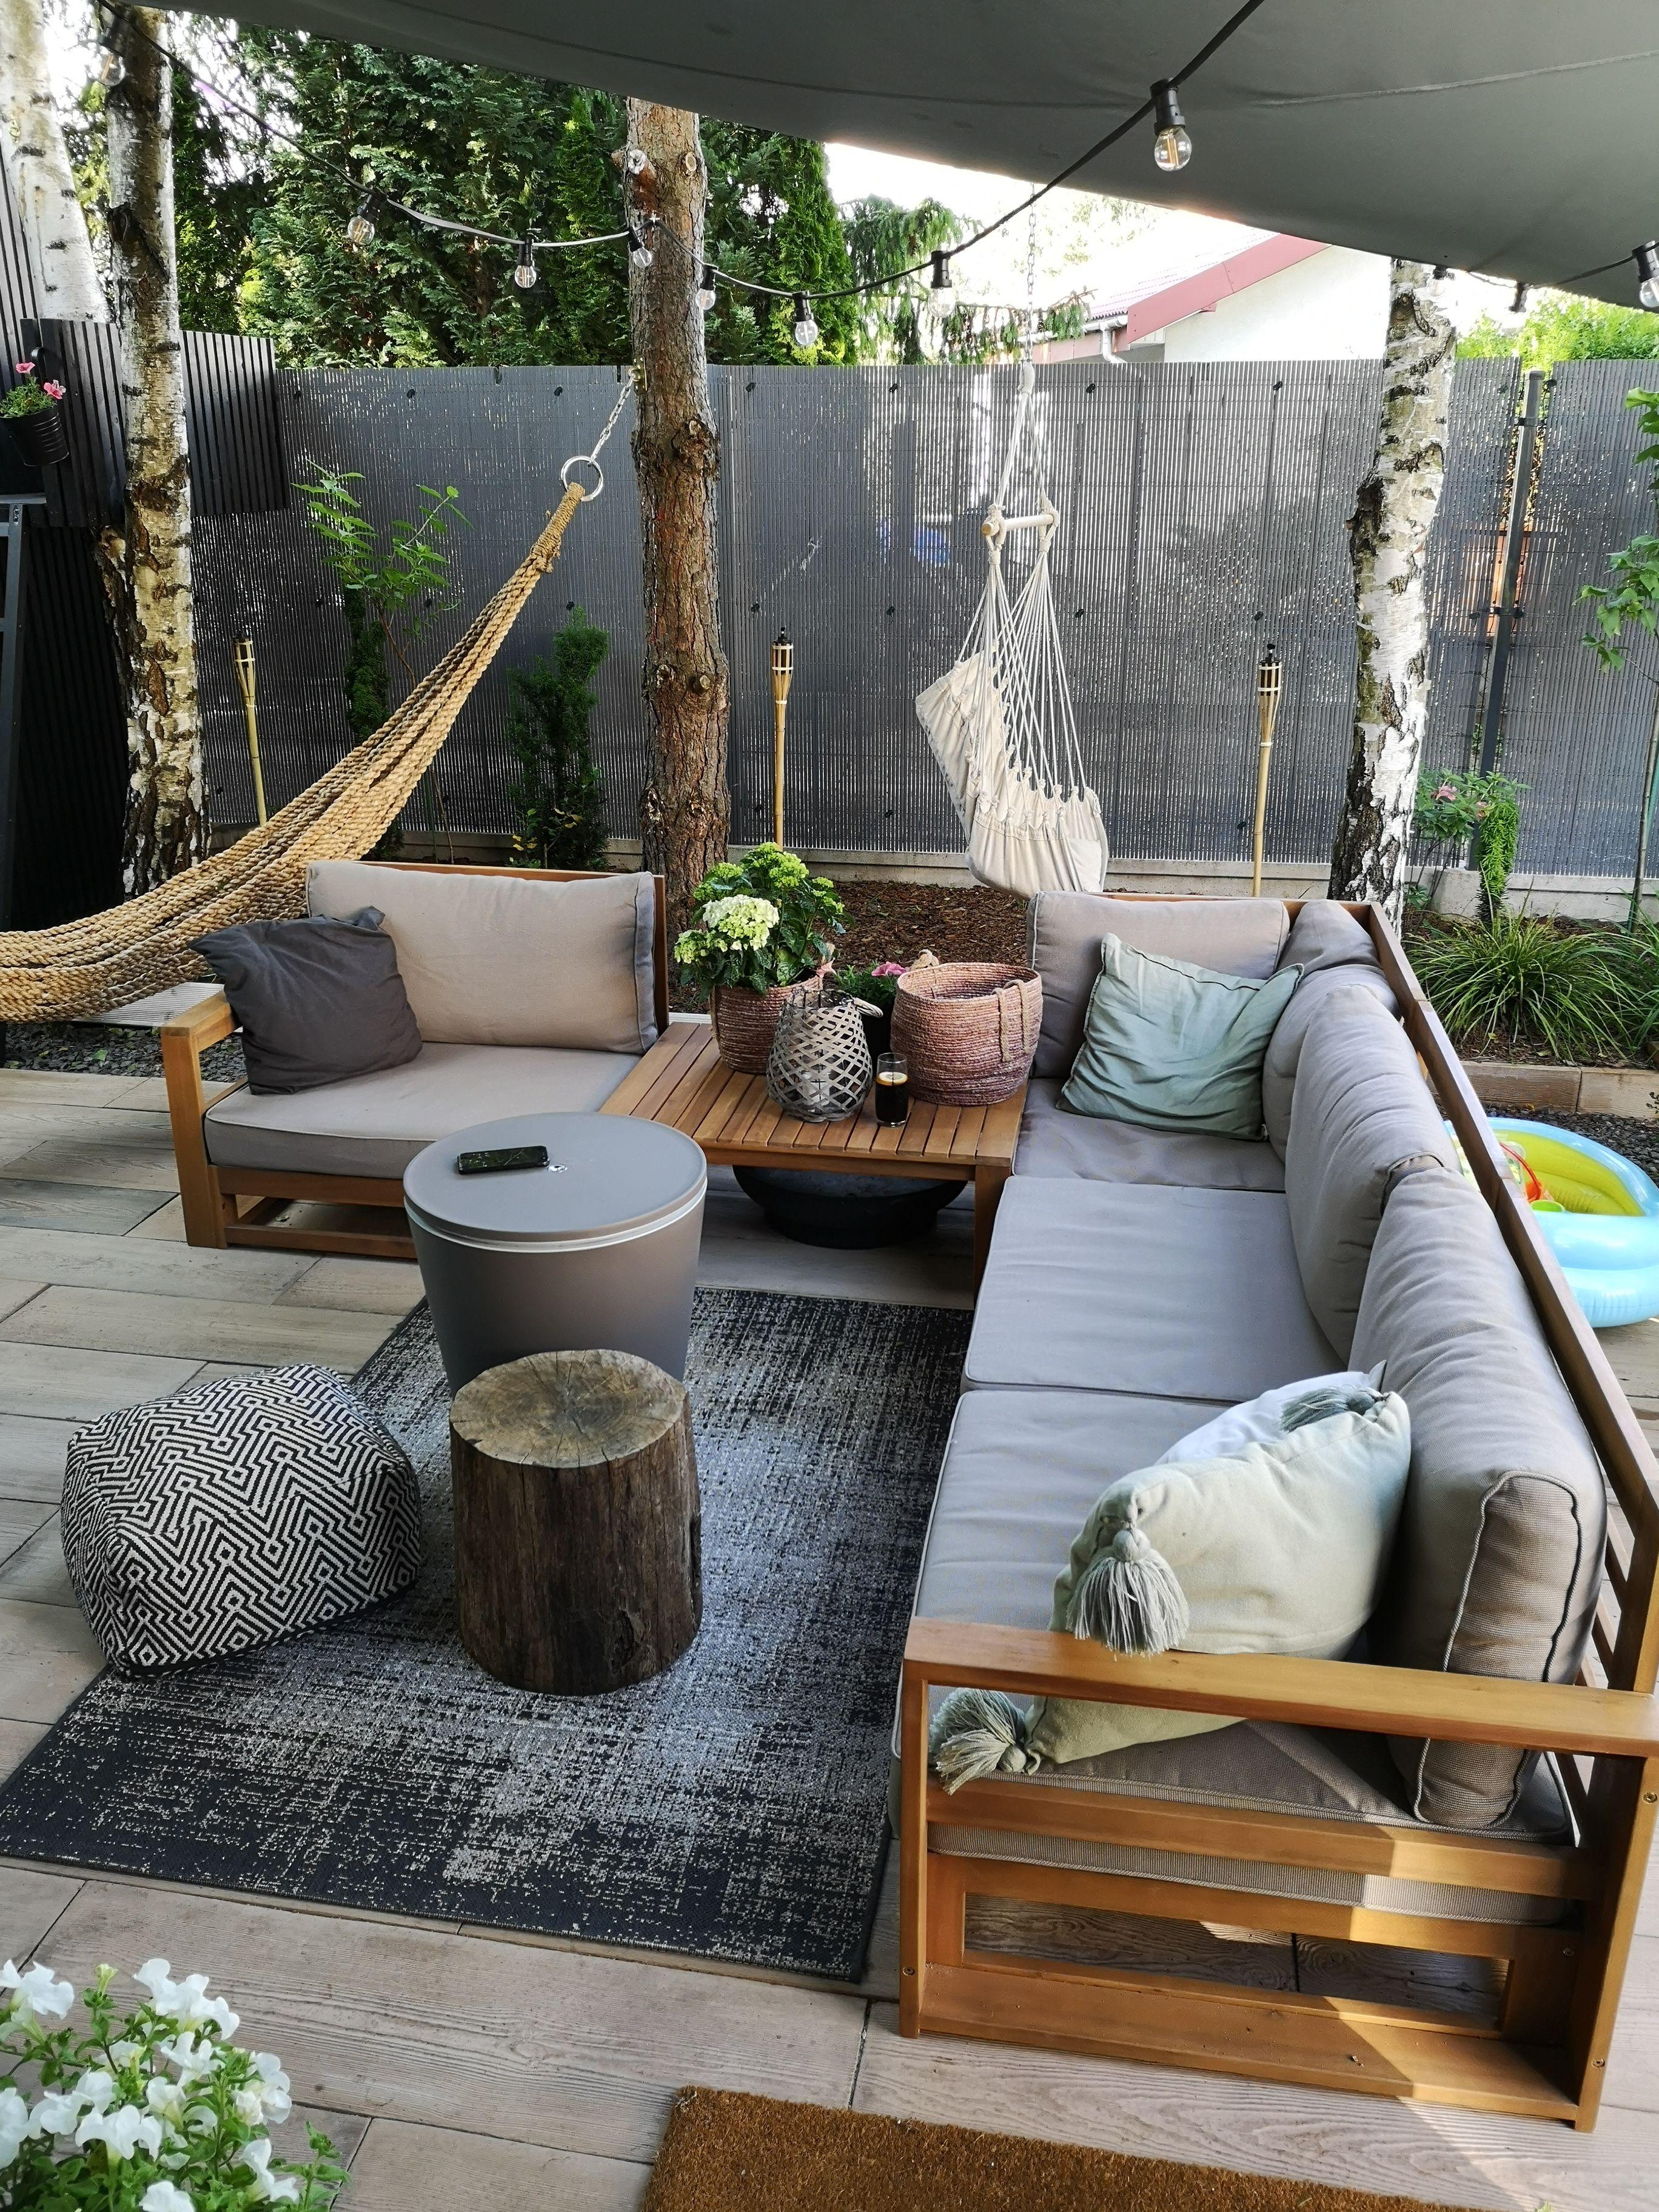 Lounge Set Zertifiziertes Holz Braun Timor Garten Lounge Set Loungeecke Garten Garten Lounge